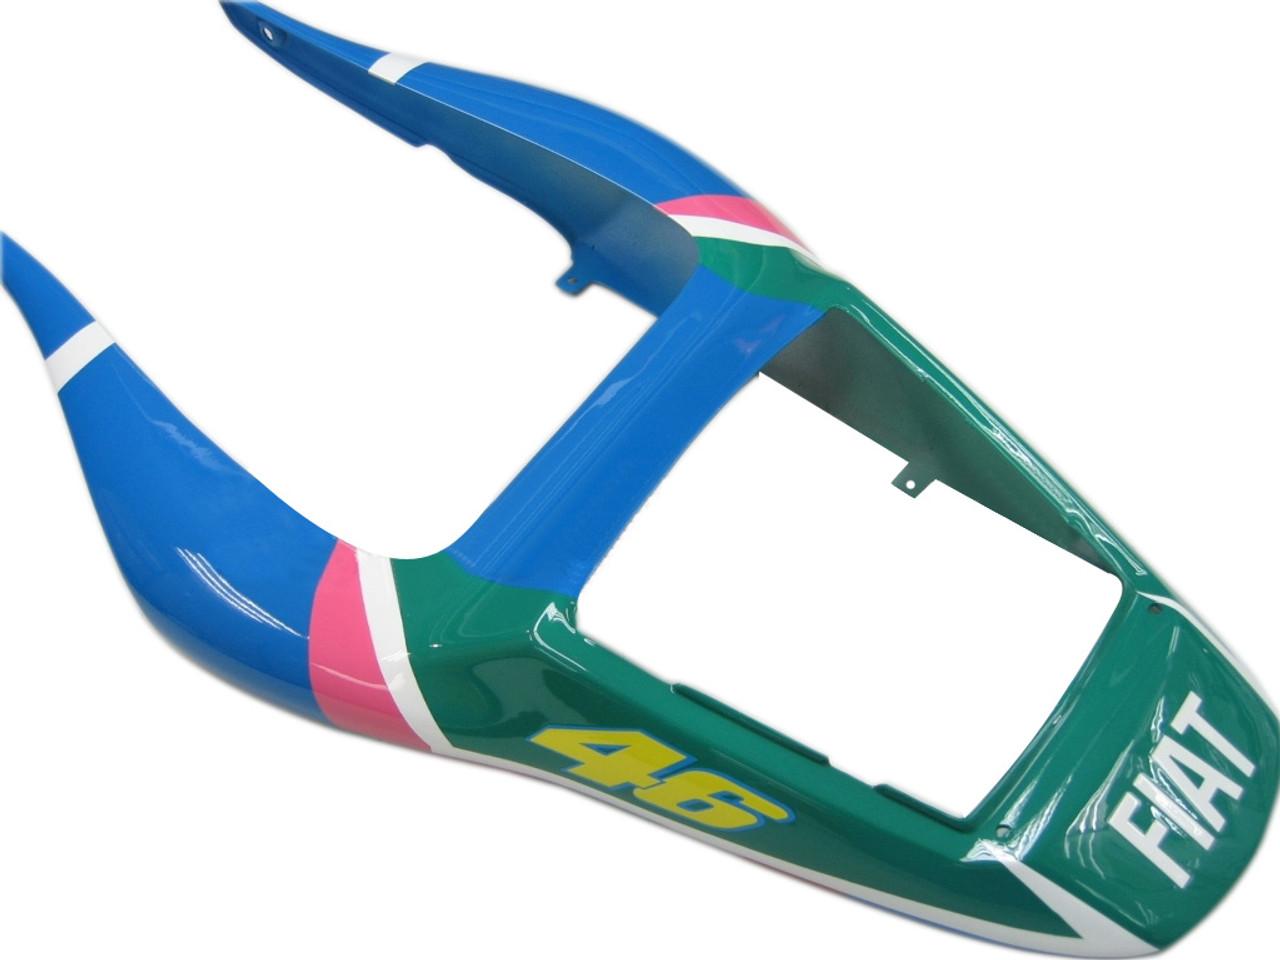 Fairings Yamaha YZF-R6 Multi-Color No.46 R6 Racing (1998-2002)